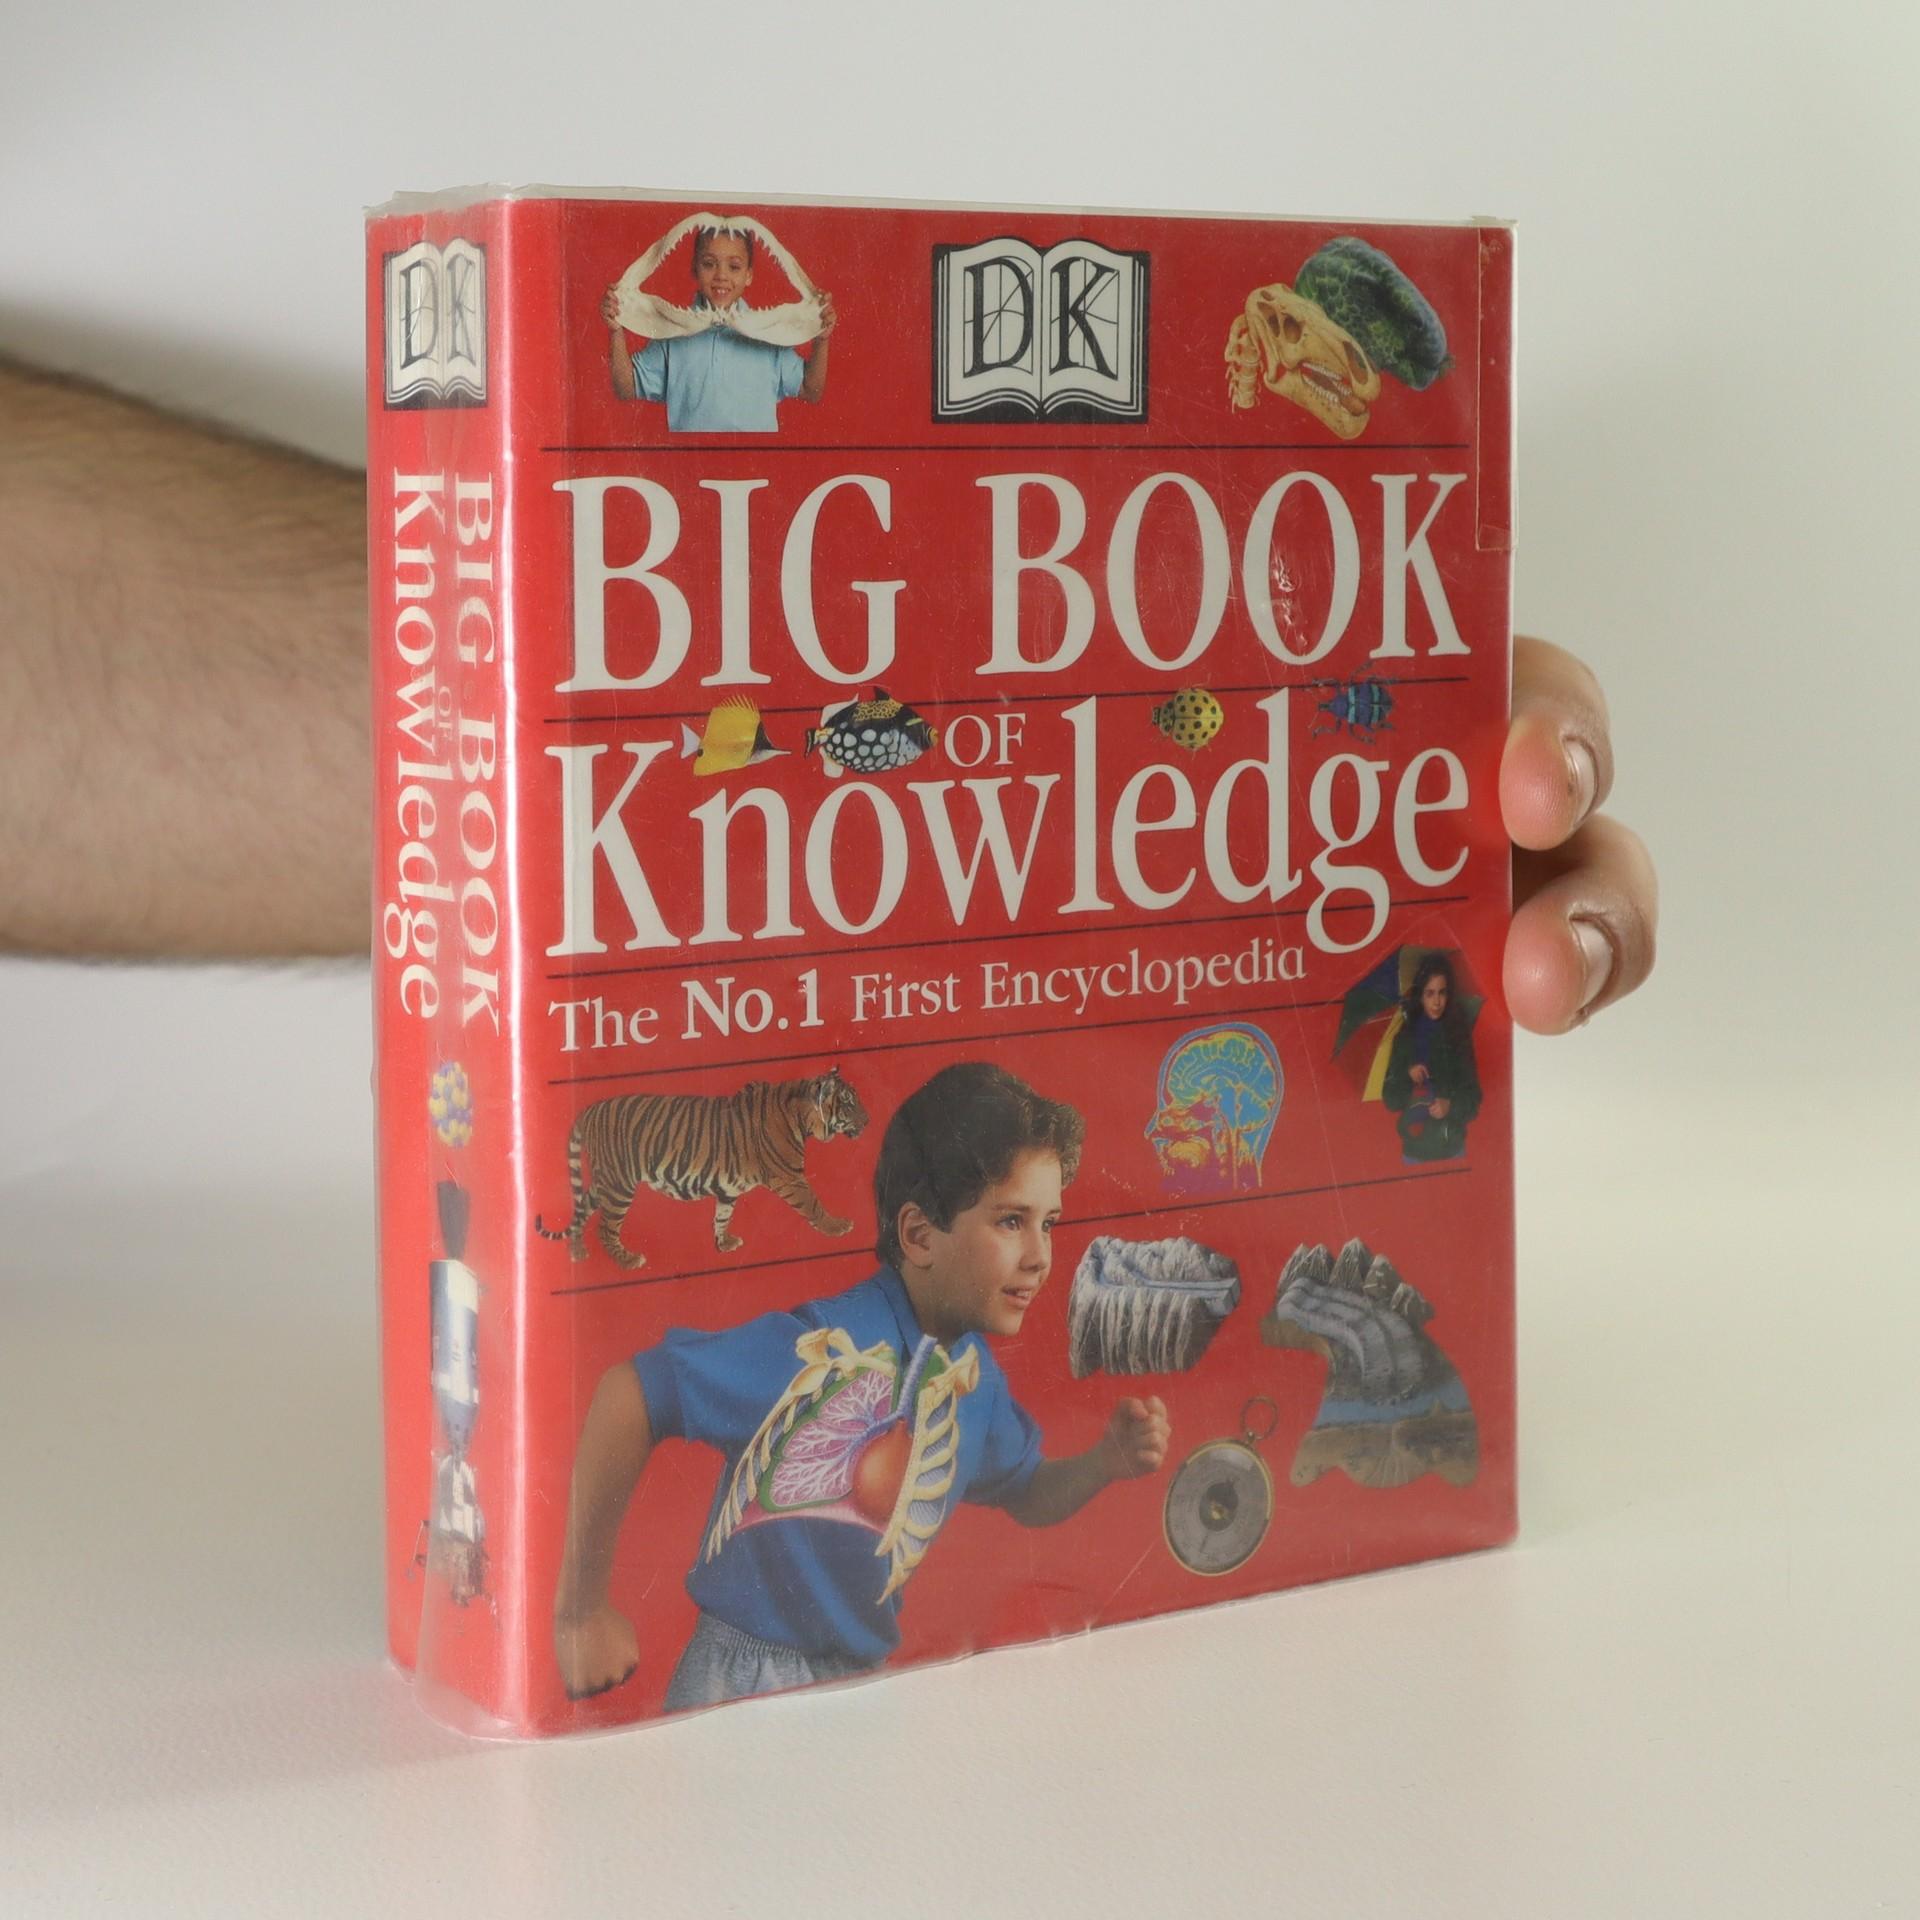 antikvární kniha Big book of knowledge. The No.1 first encyclopedia, 1999